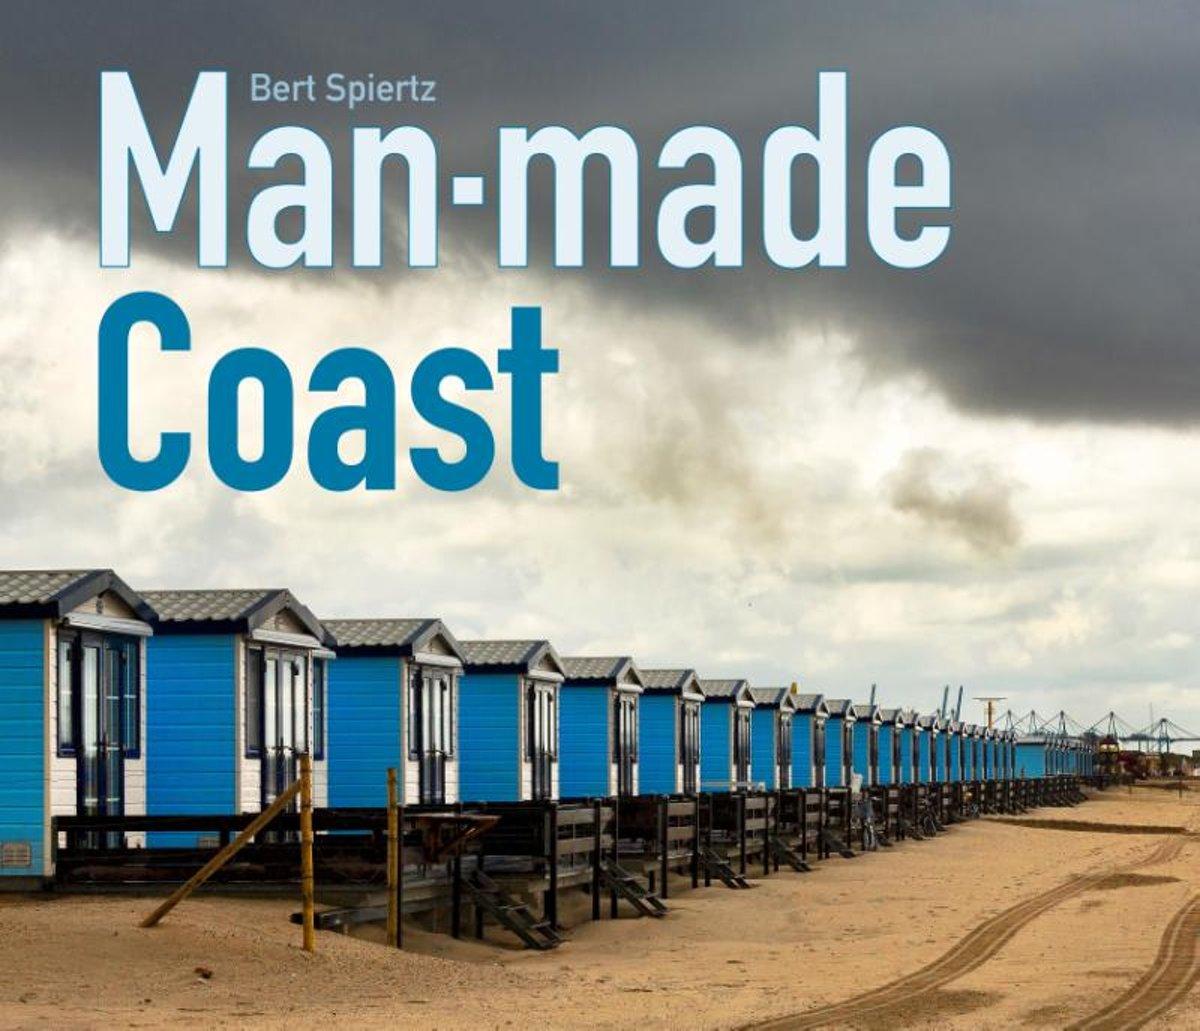 Man-made coast